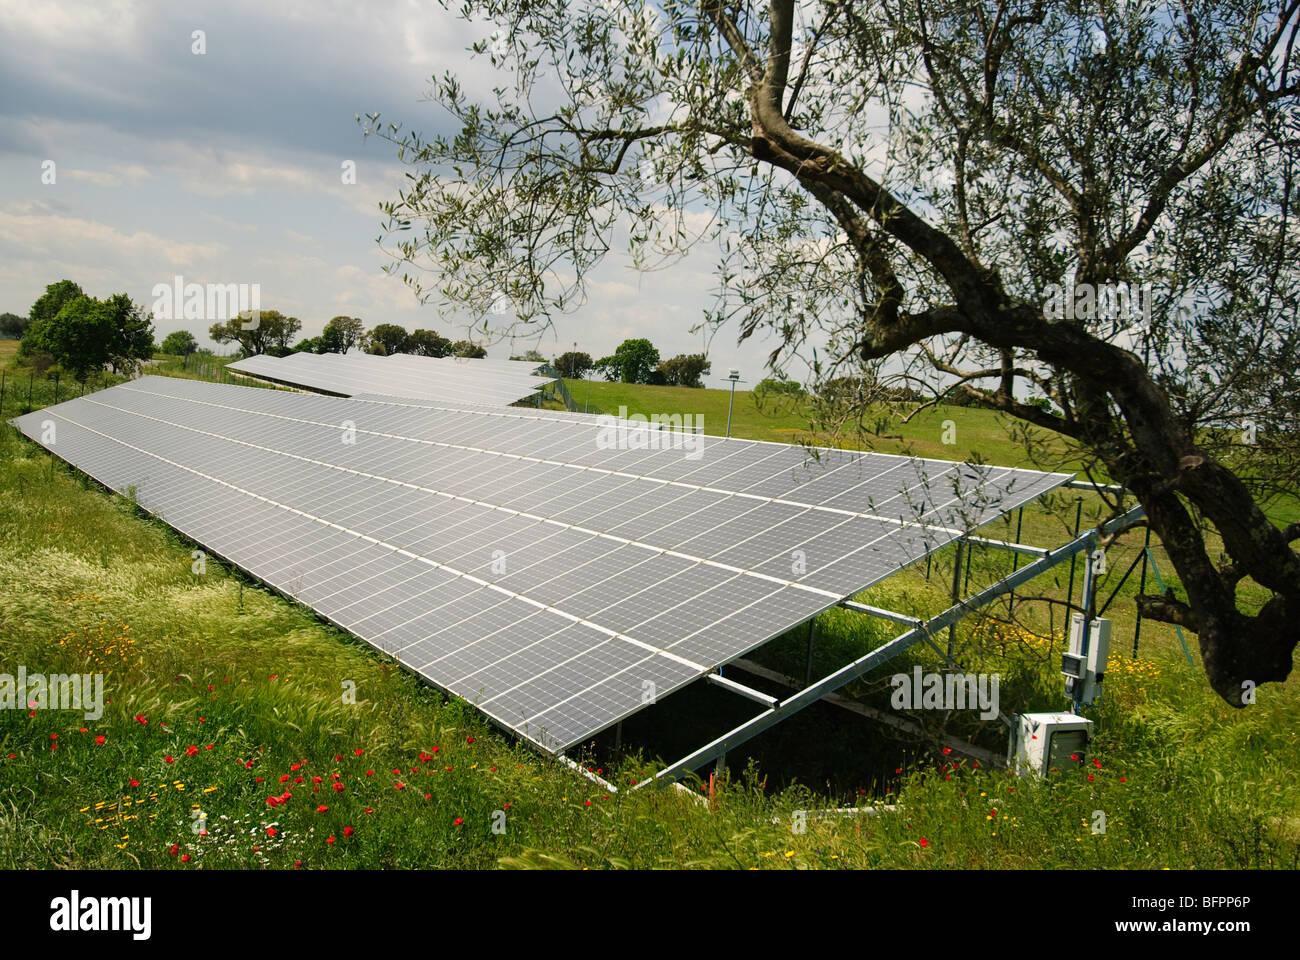 Photovoltaic panels, Tarquinia, Lazio, Italy - Stock Image